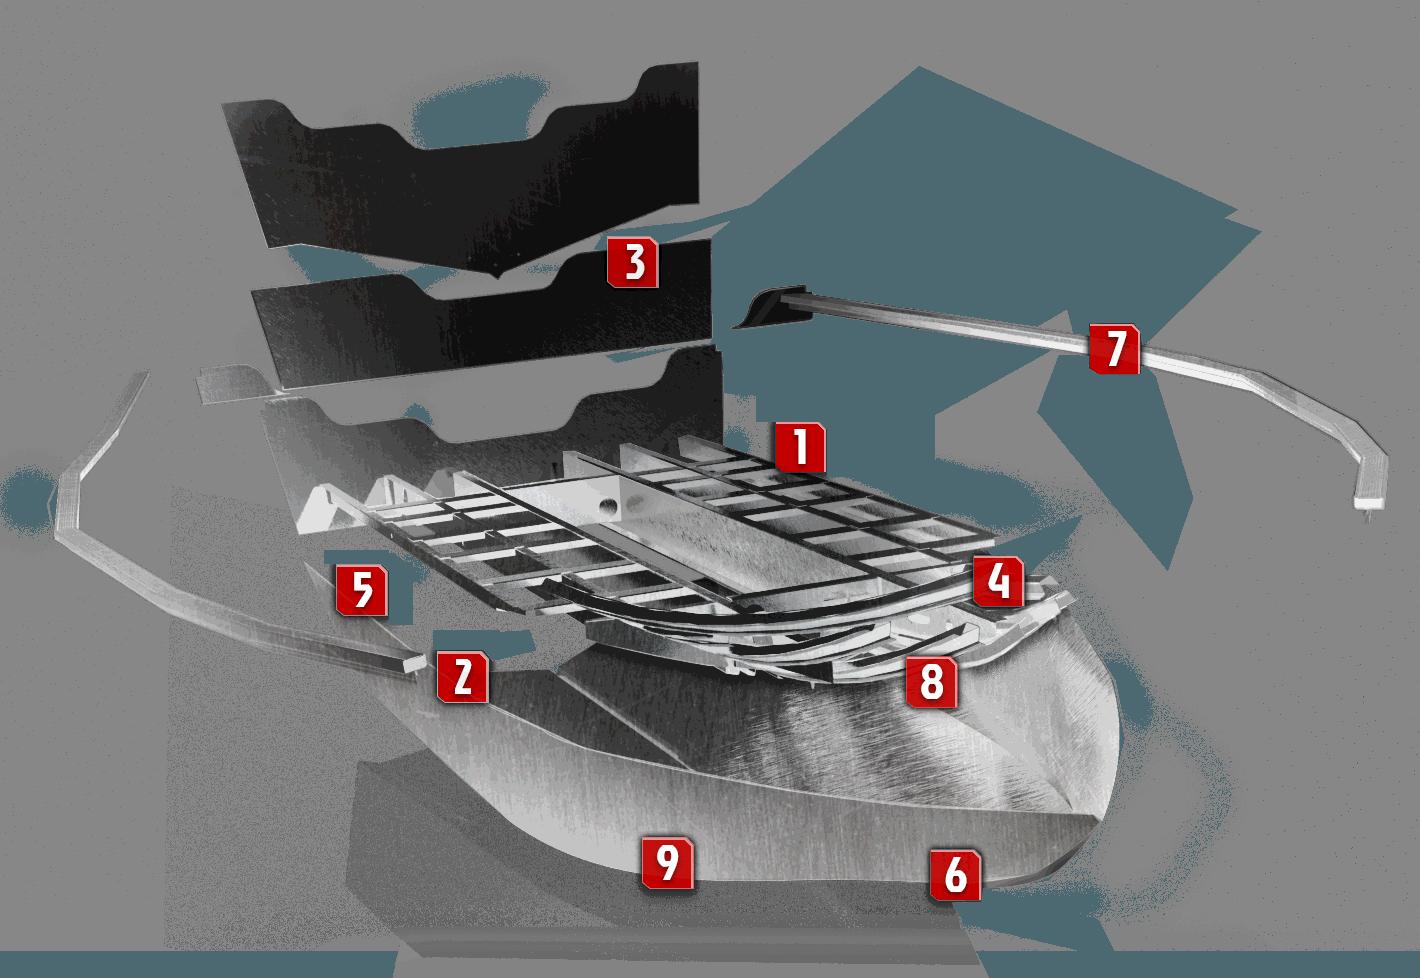 Lowe Boats Aluminum Fishing Boat Construction 1996 Wiring Diagram Deep V